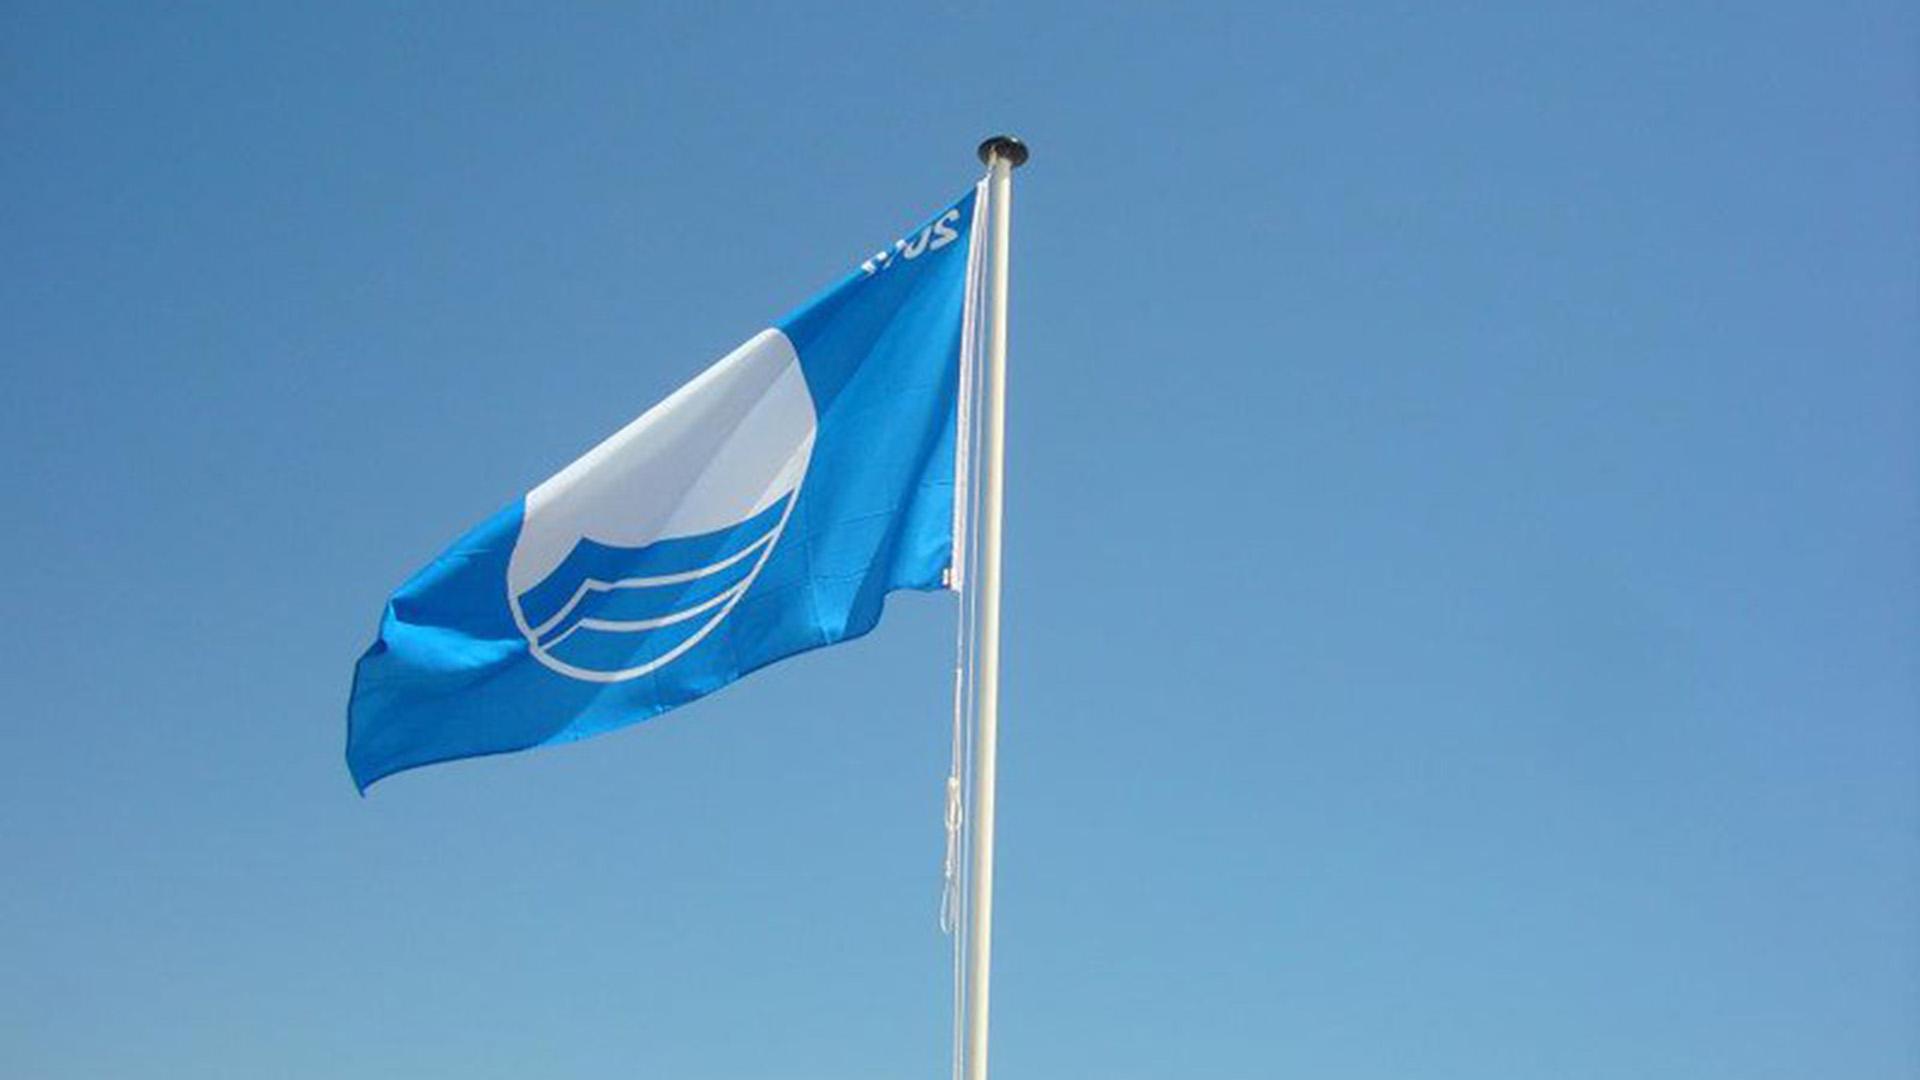 Banderas azules playas